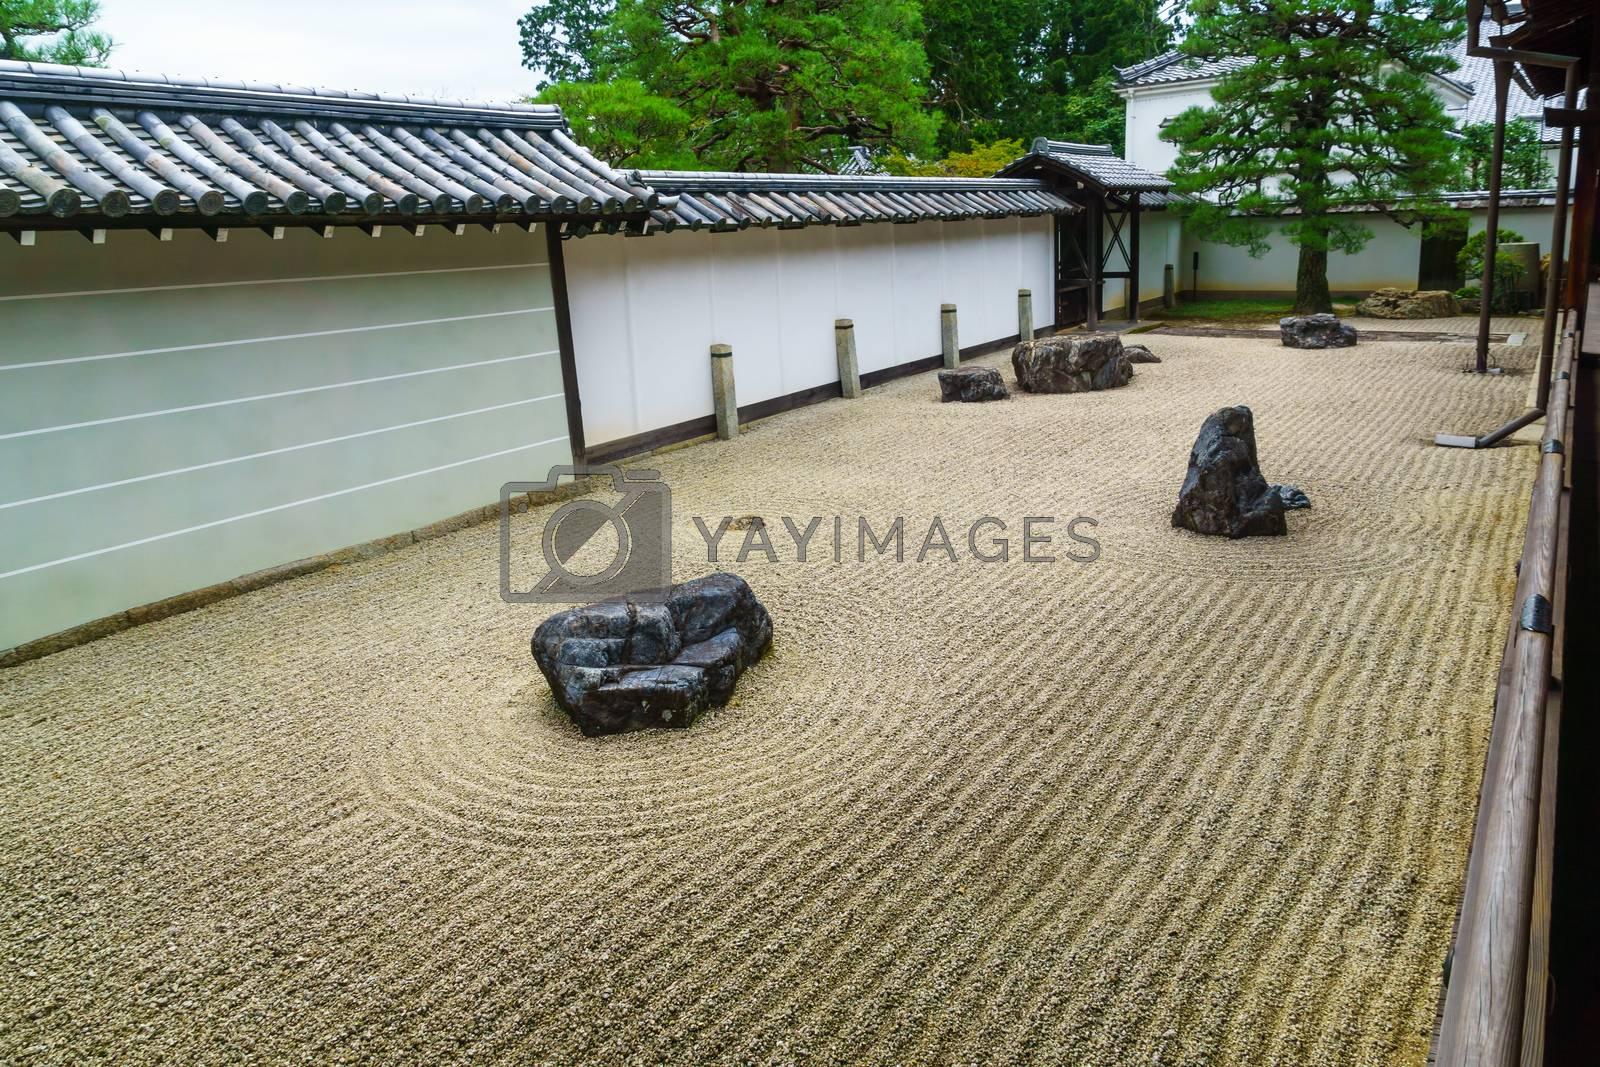 View of Japanese Rock Garden of the Nanzen-ji Temple, in Kyoto, Japan